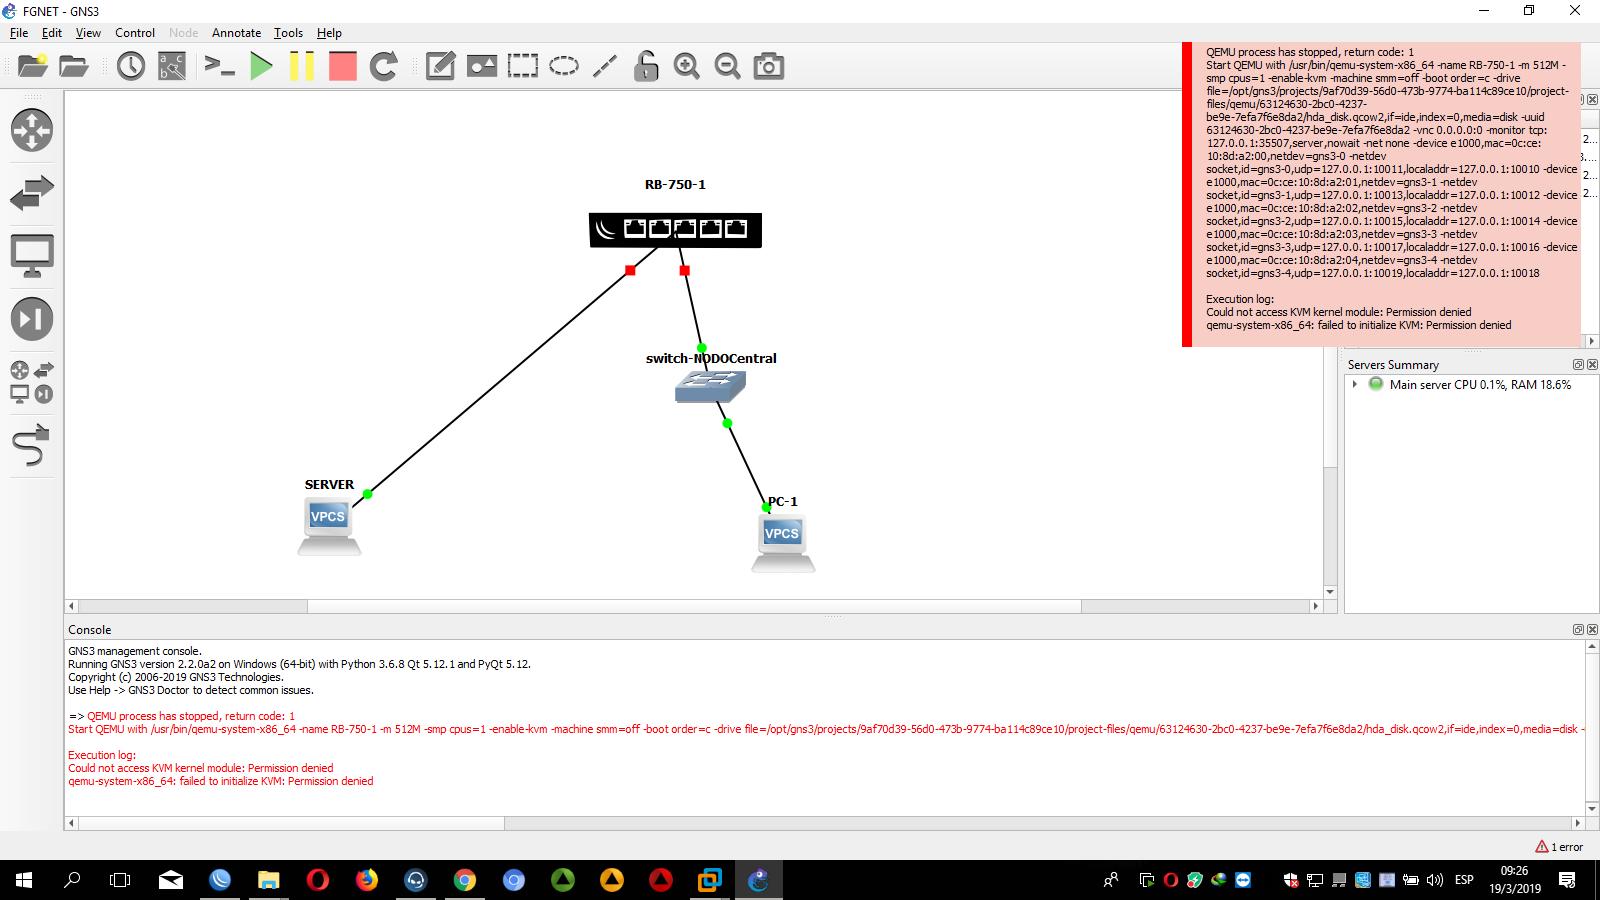 [Solved] Could not access KVM kernel module: Permission denied